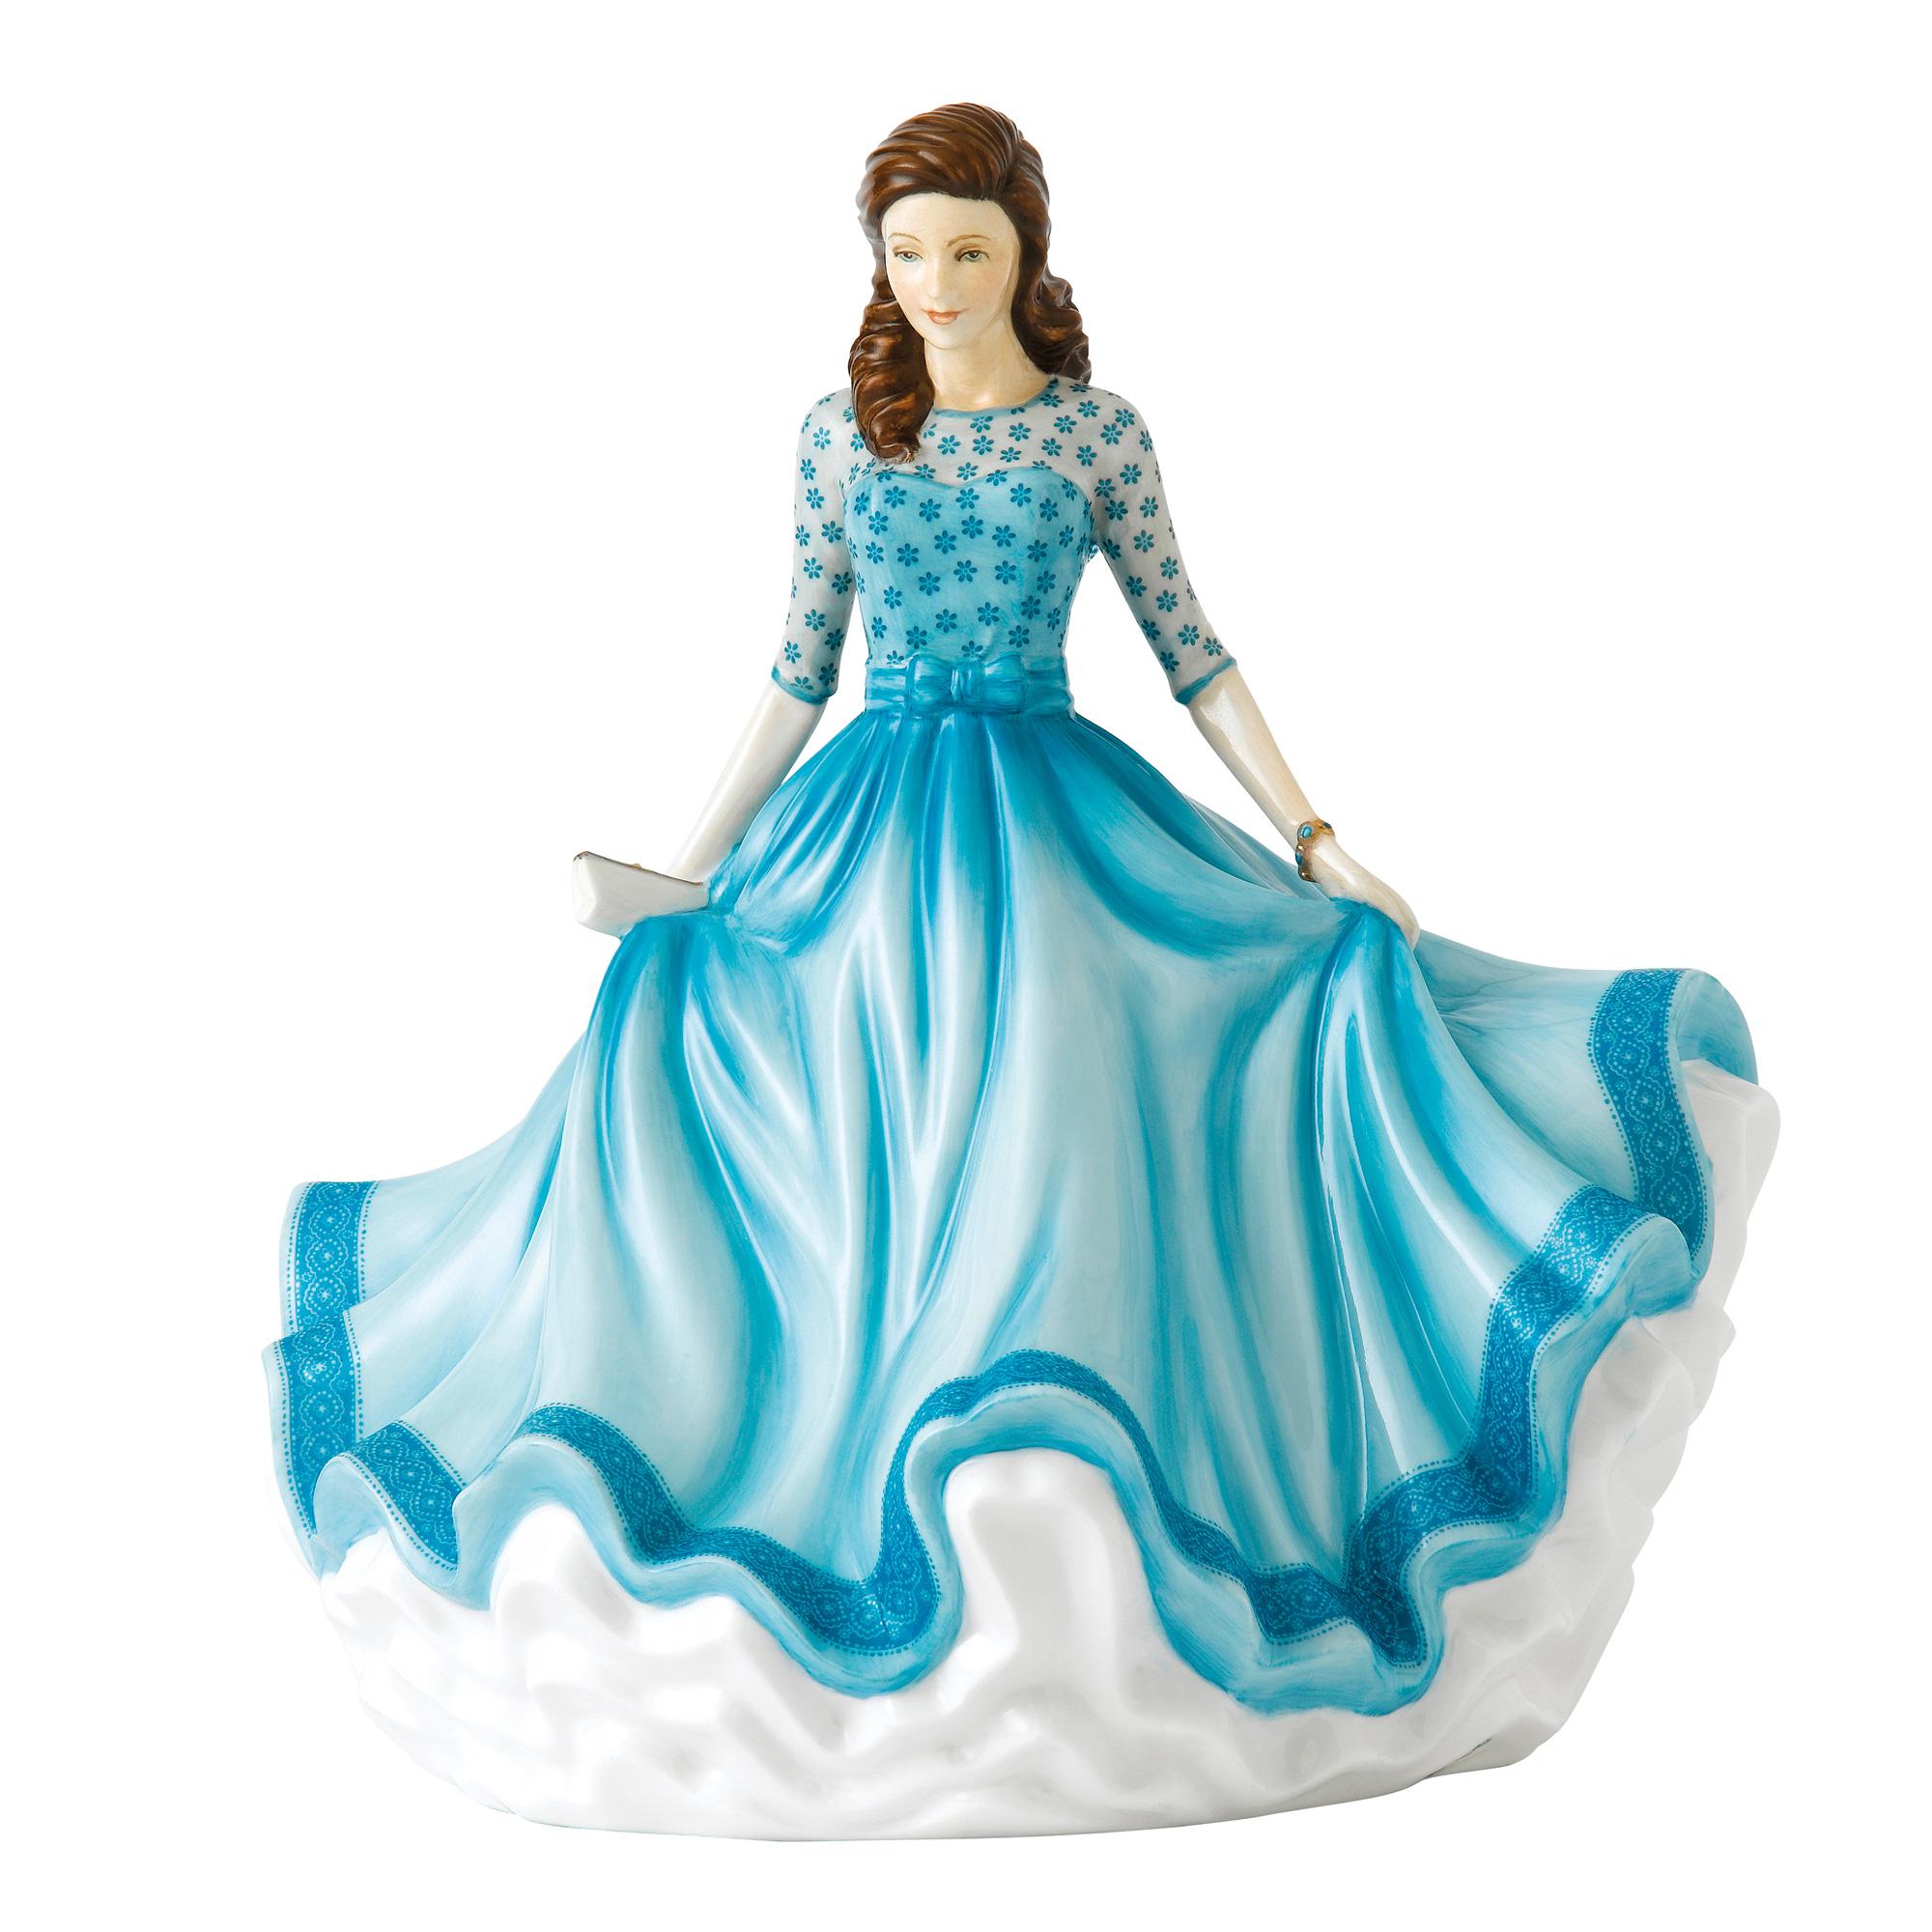 Megan HN5815 - Royal Doulton Figurine